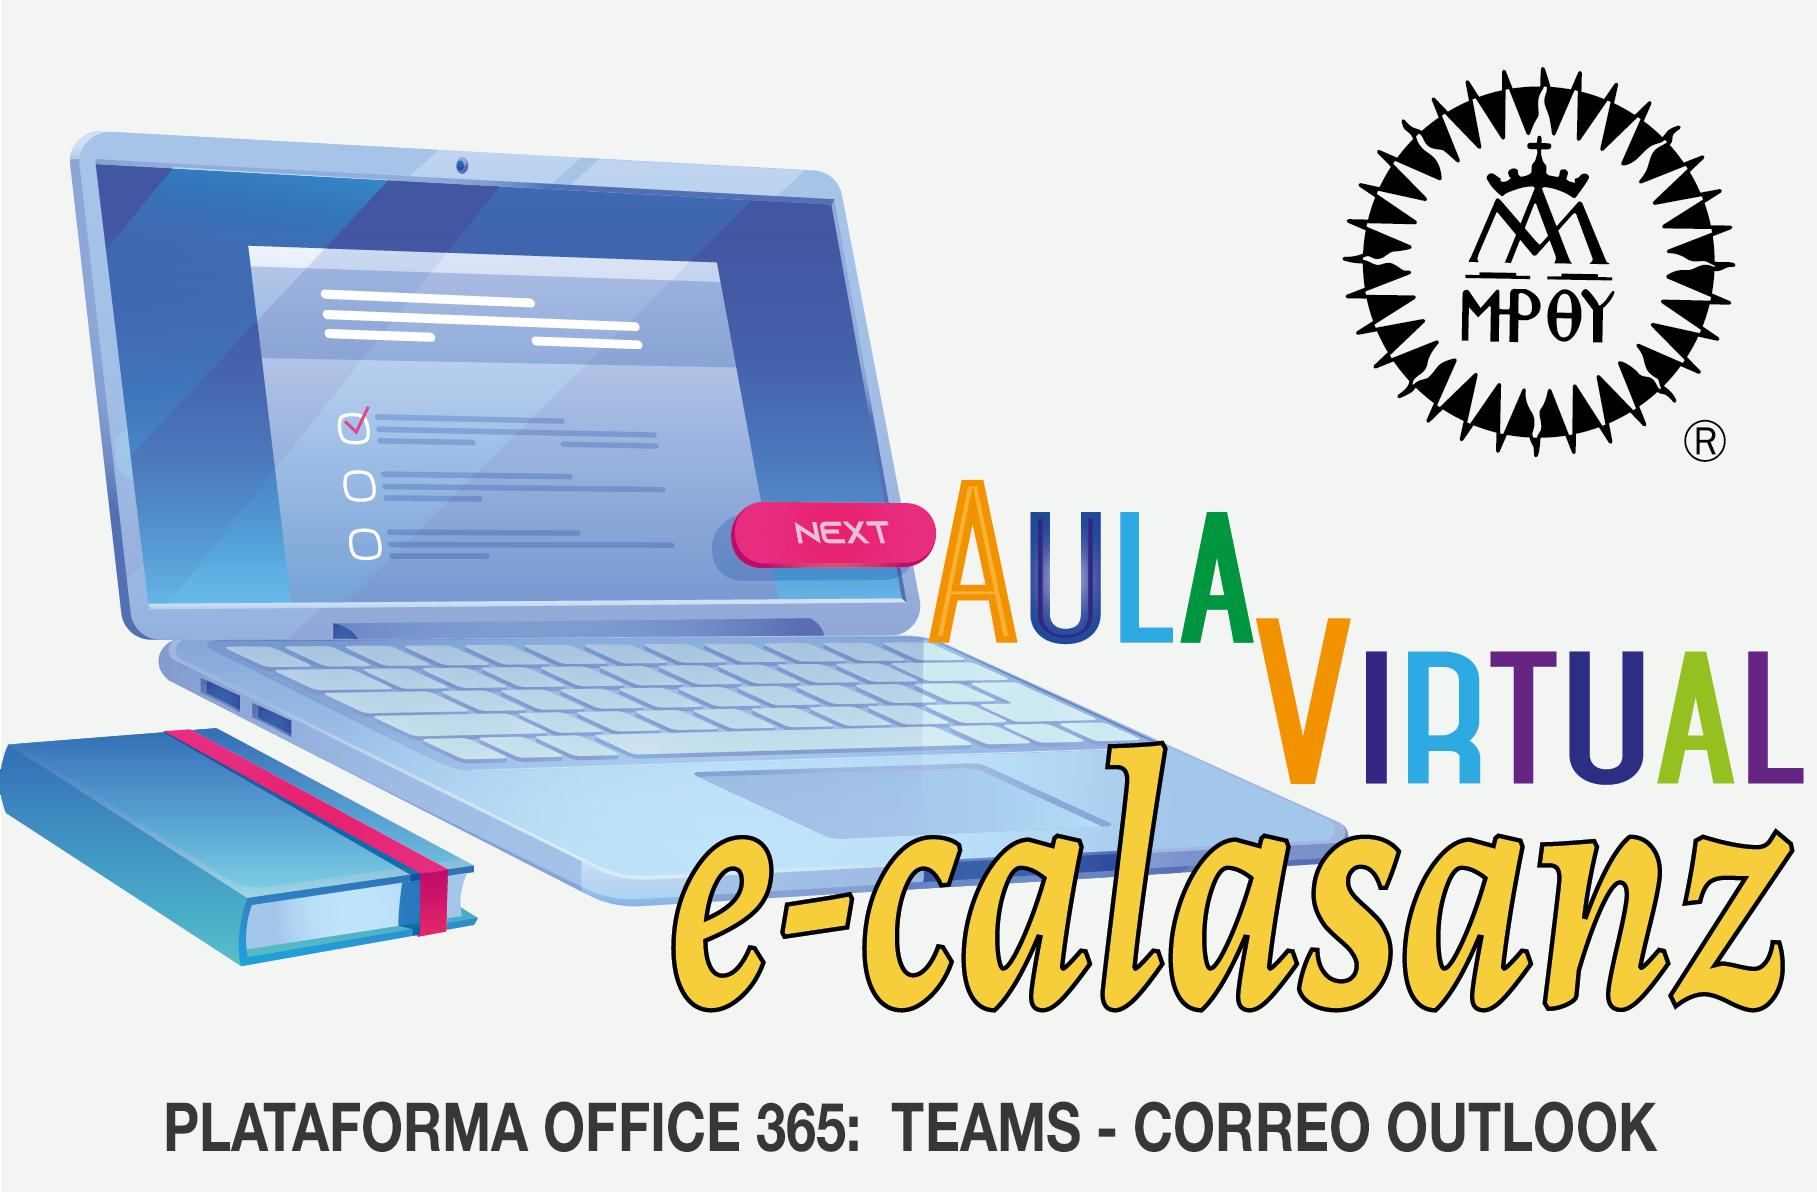 Clic para ingresar al Aula Virtual